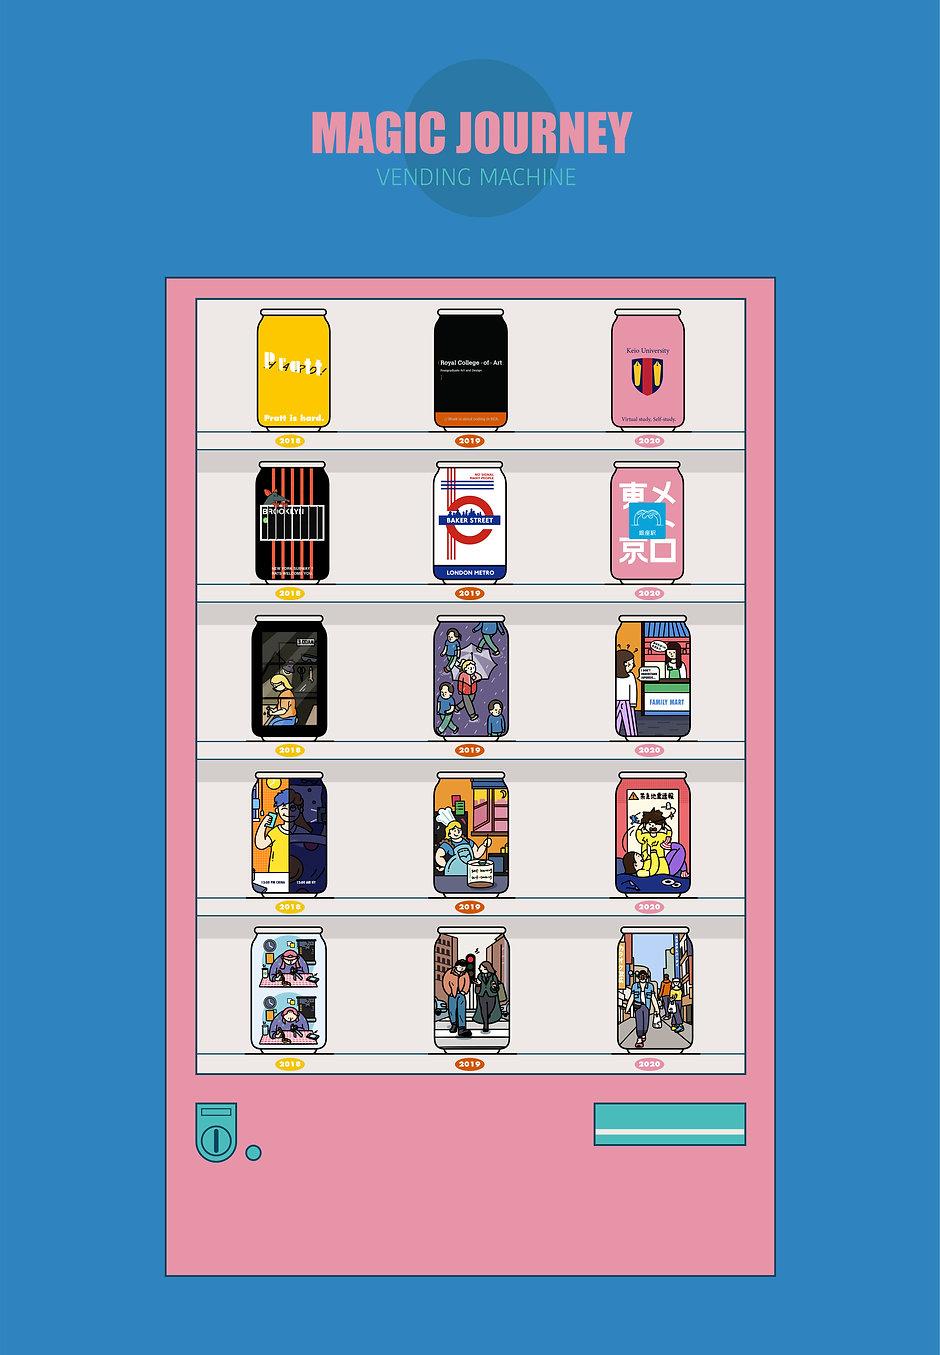 vending machine-02.jpg